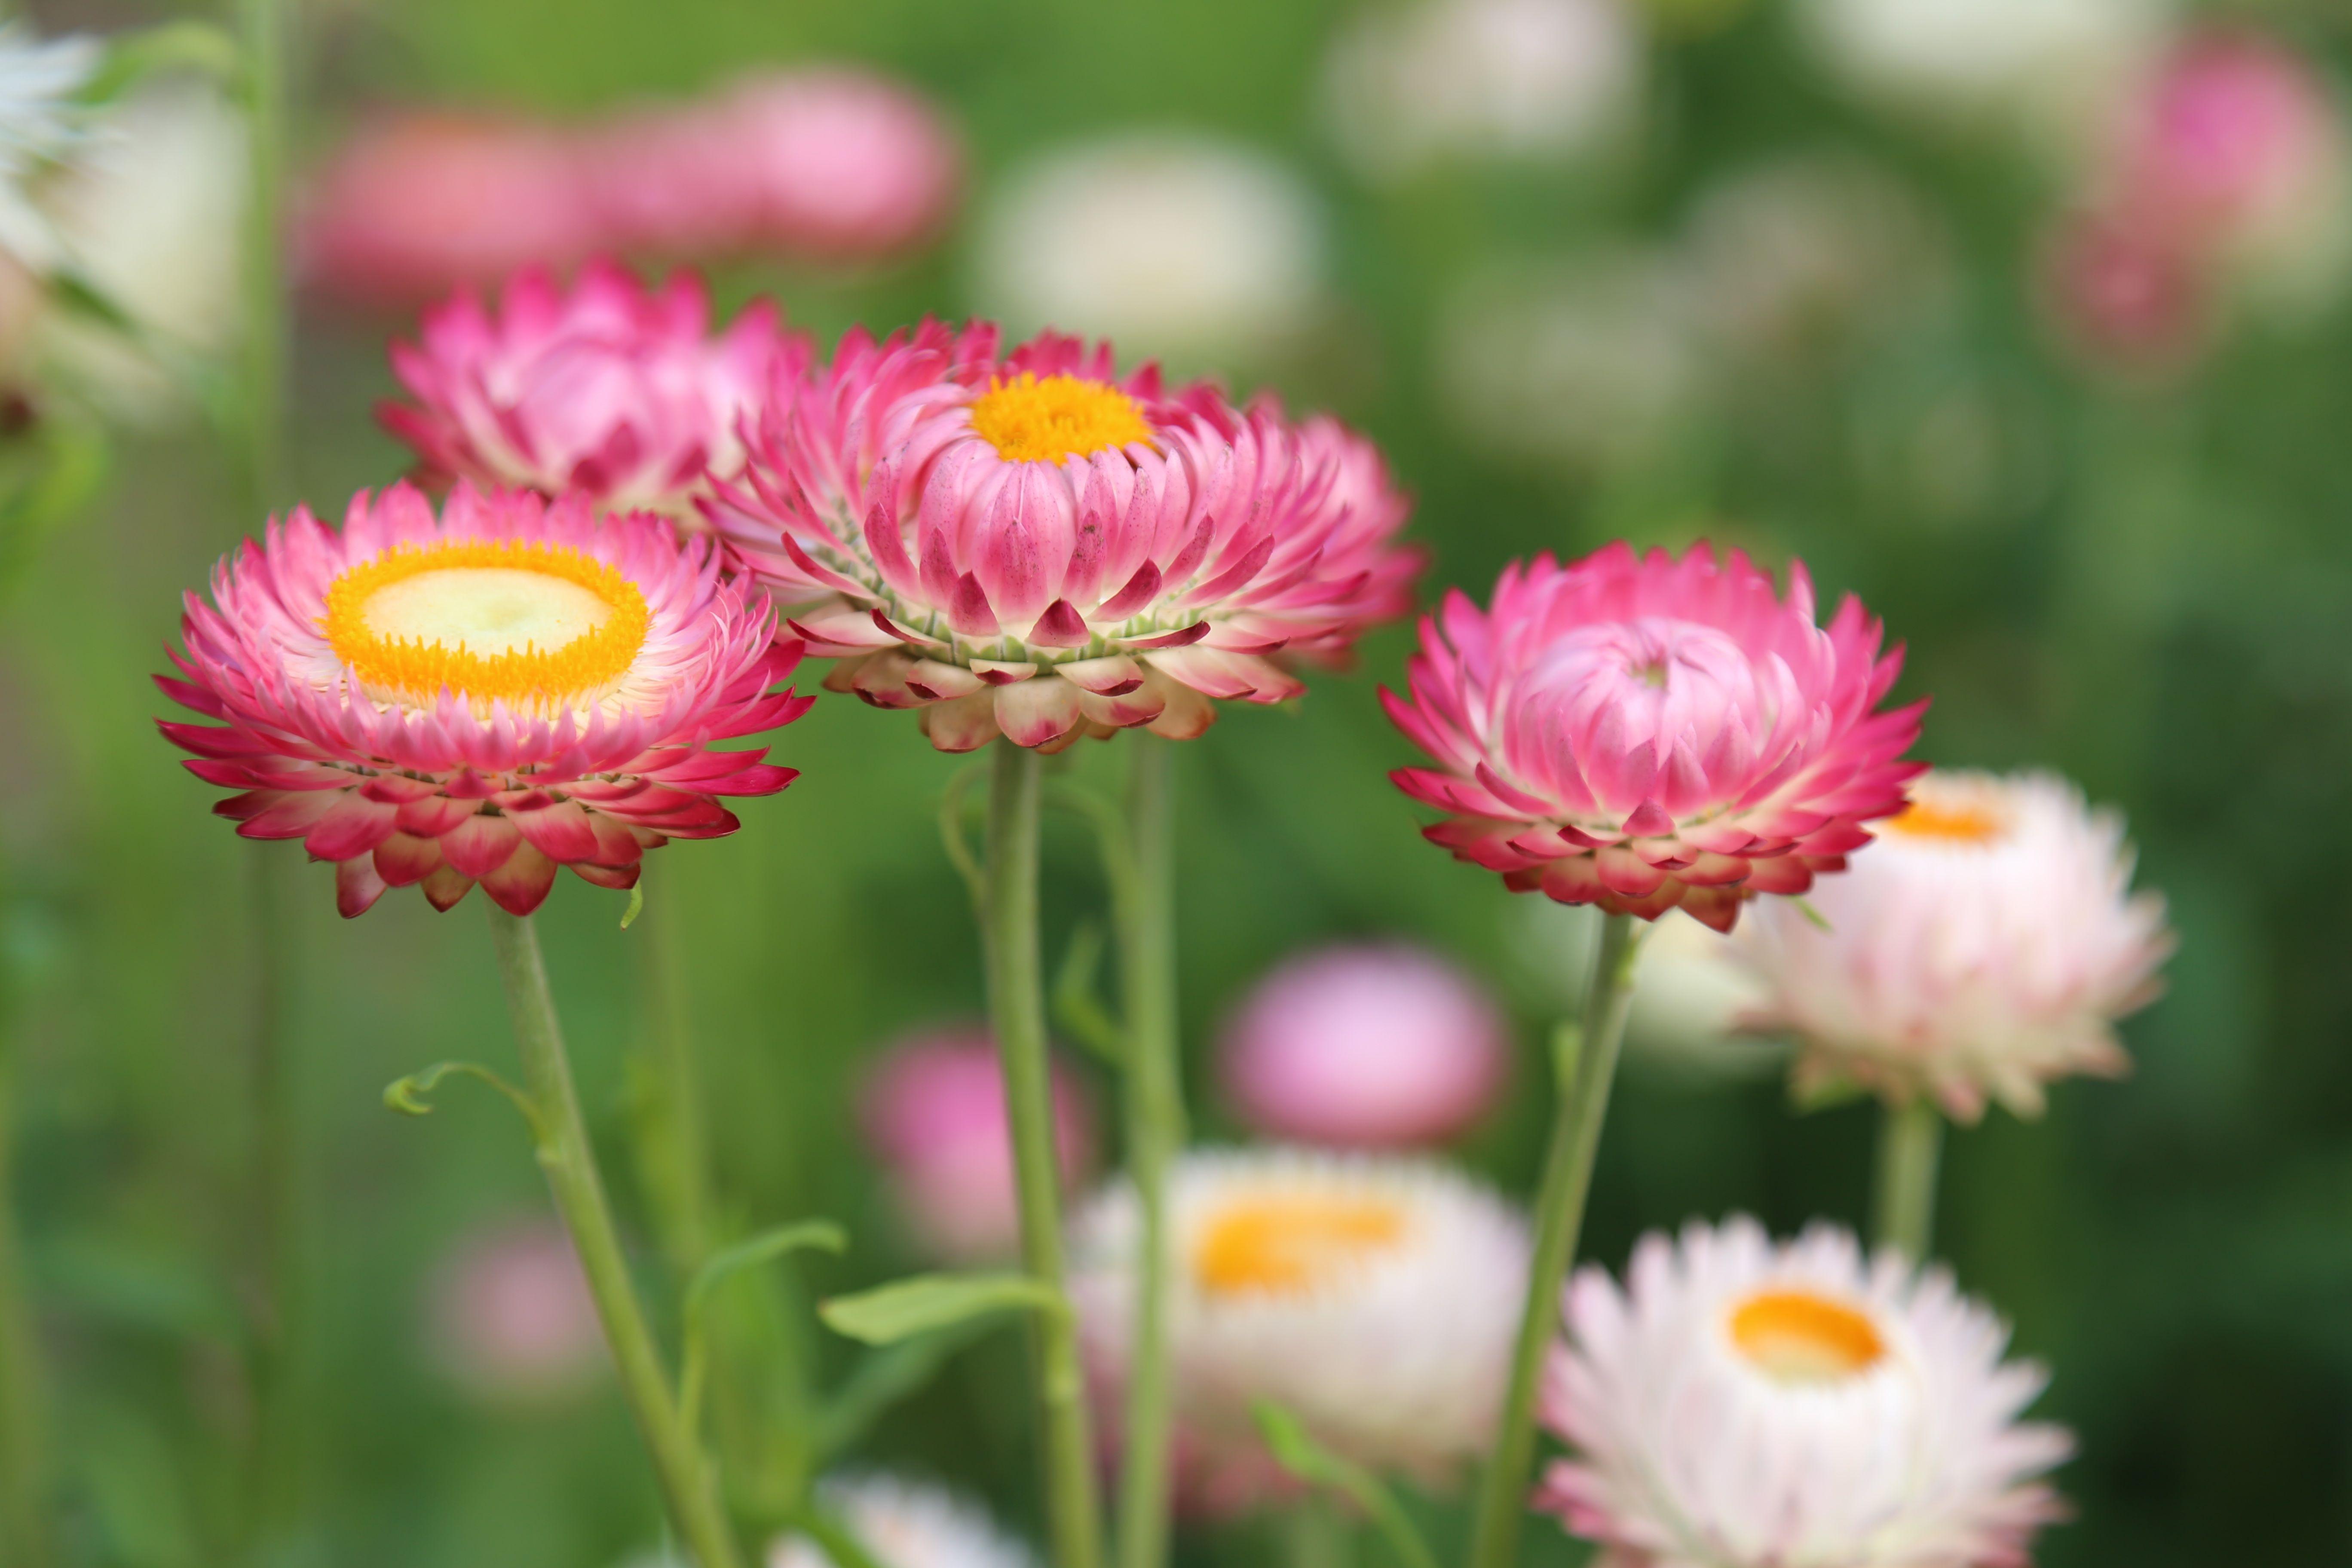 Pin by diana regina on flowers pinterest flowers